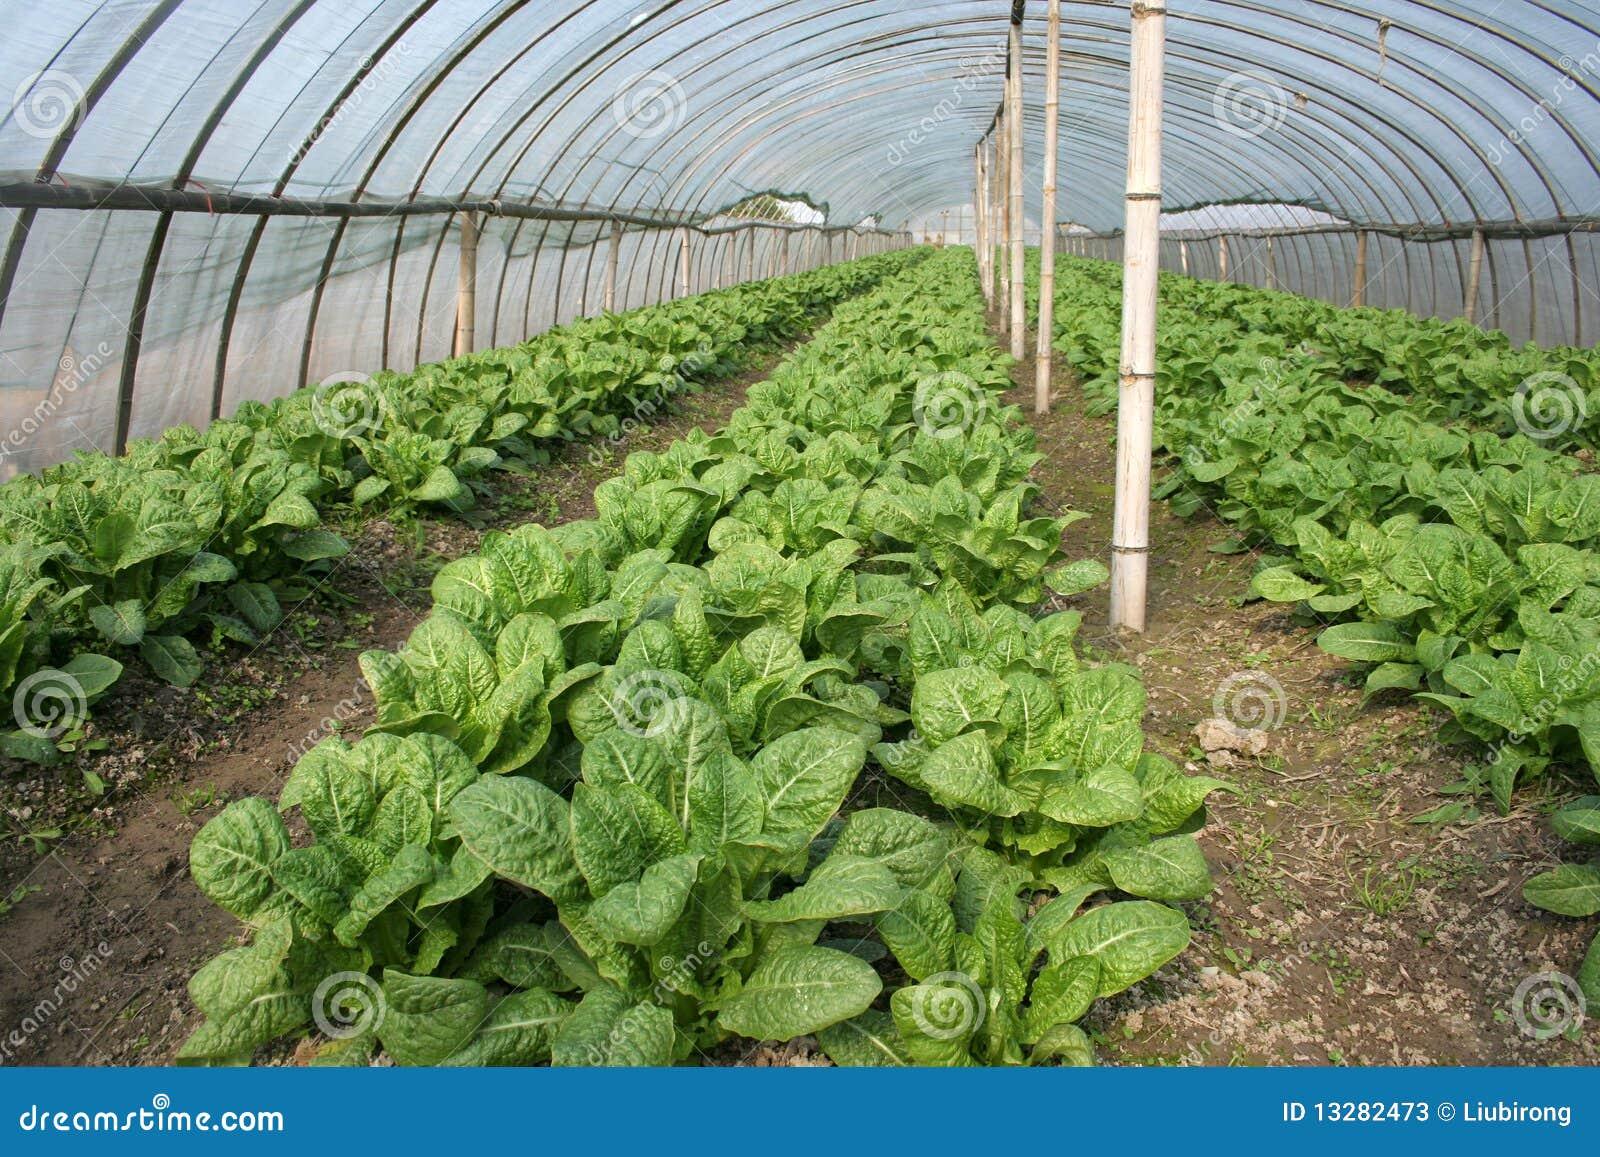 culture de serre chaude image stock image du greenhouse 13282473. Black Bedroom Furniture Sets. Home Design Ideas